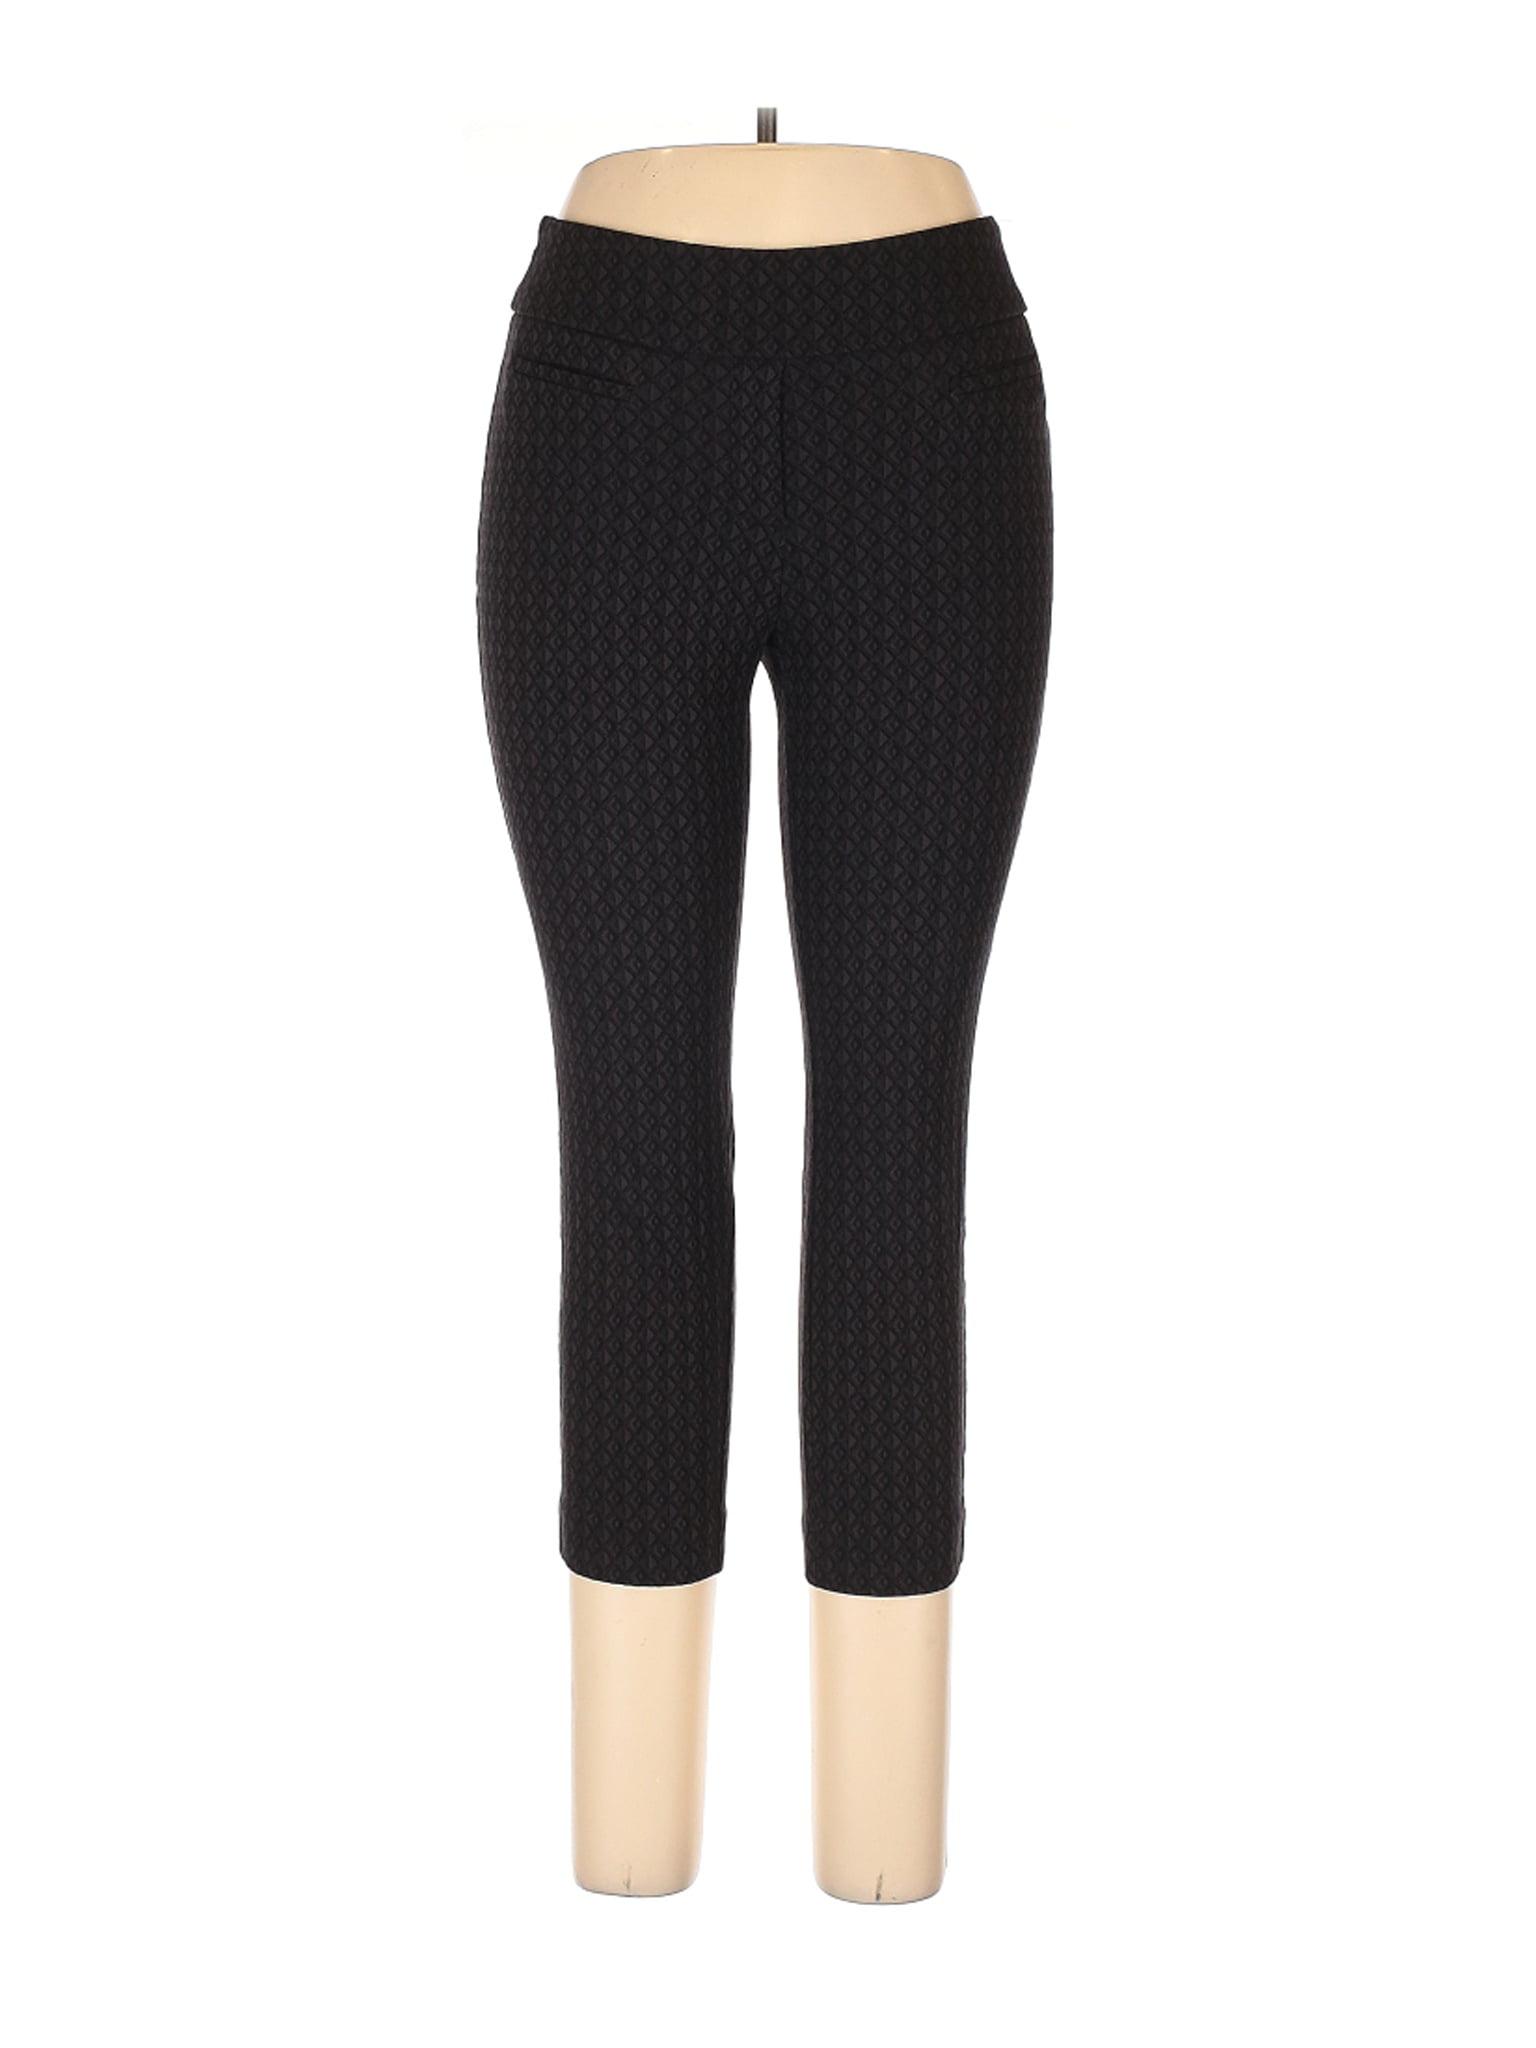 Apt. 9 - Pre-Owned Apt. 9 Women's Size 8 Dress Pants ...